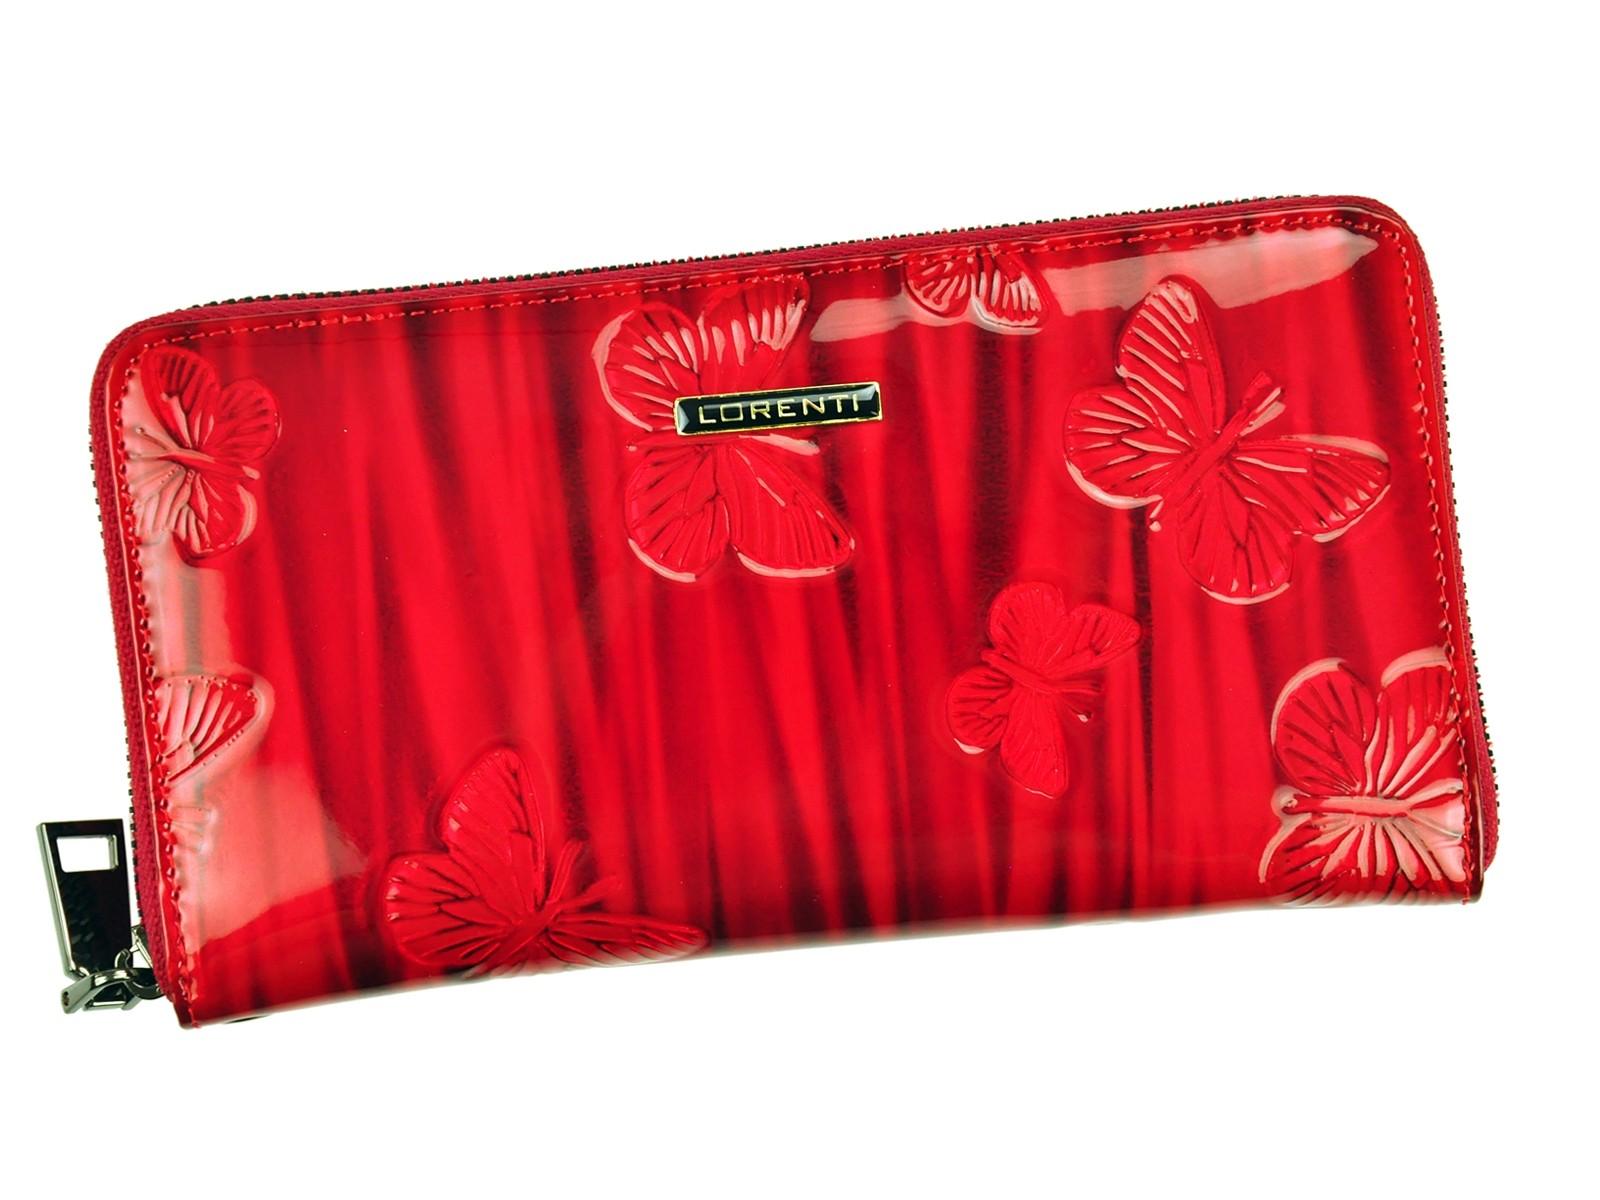 0efb59e09f Dámská kožená peněženka Lorenti Beata - červená